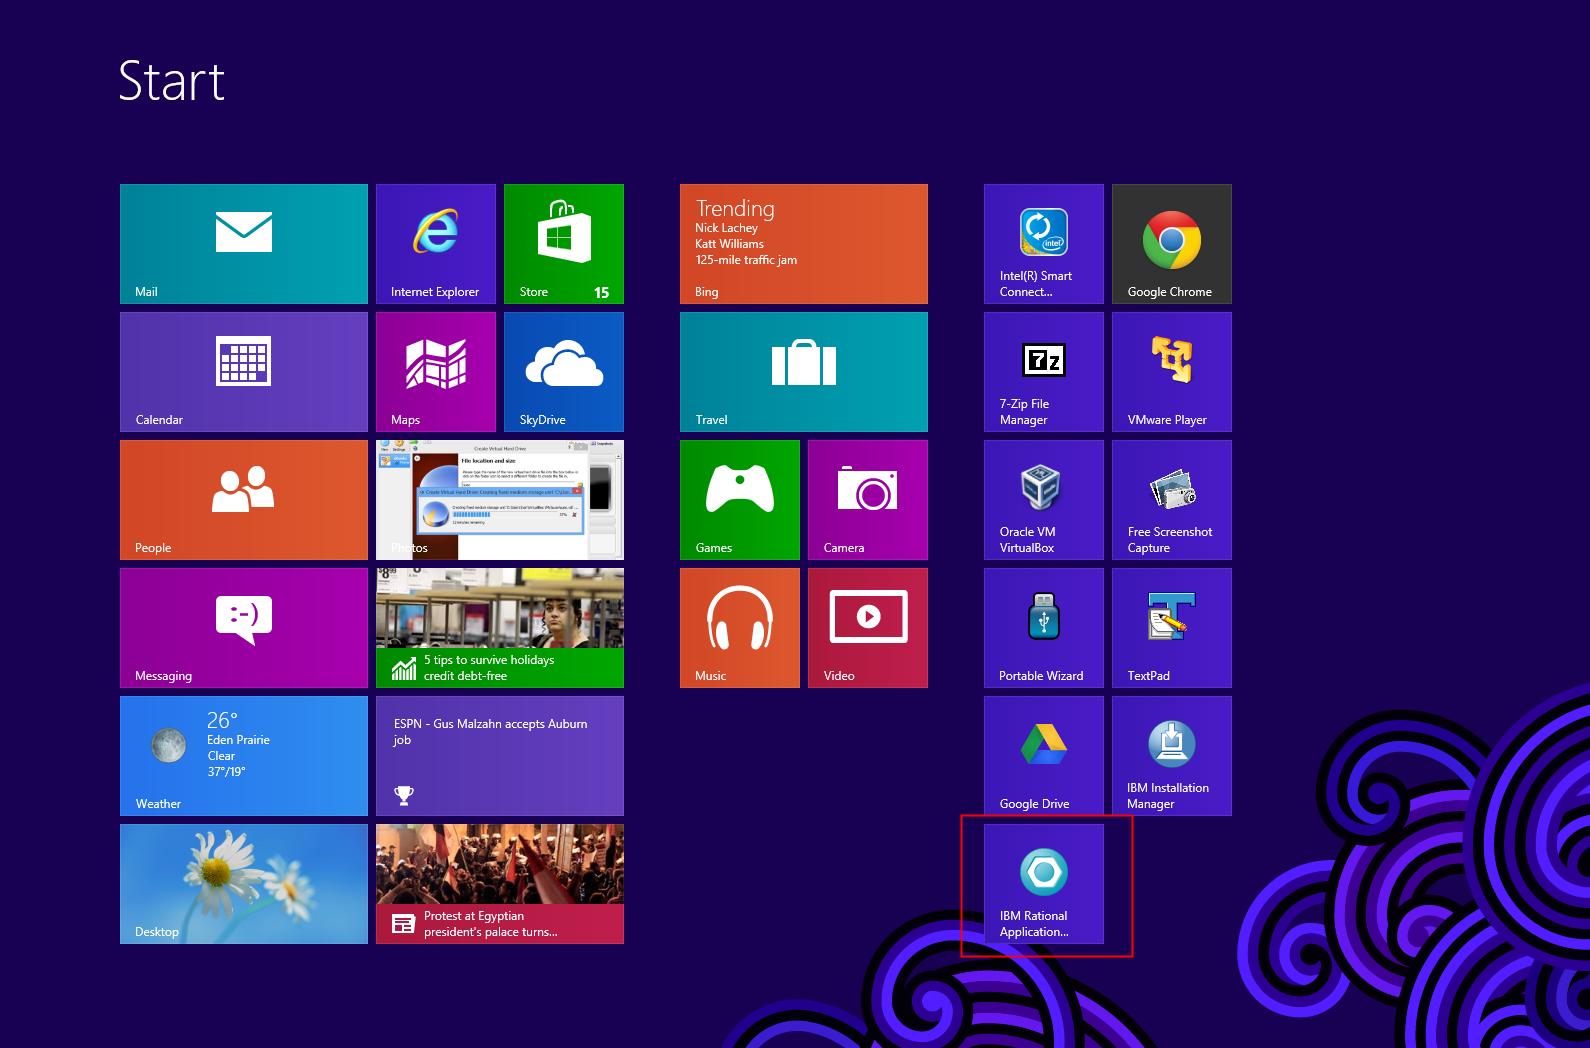 Wcs V7 Toolkit On Windows 8